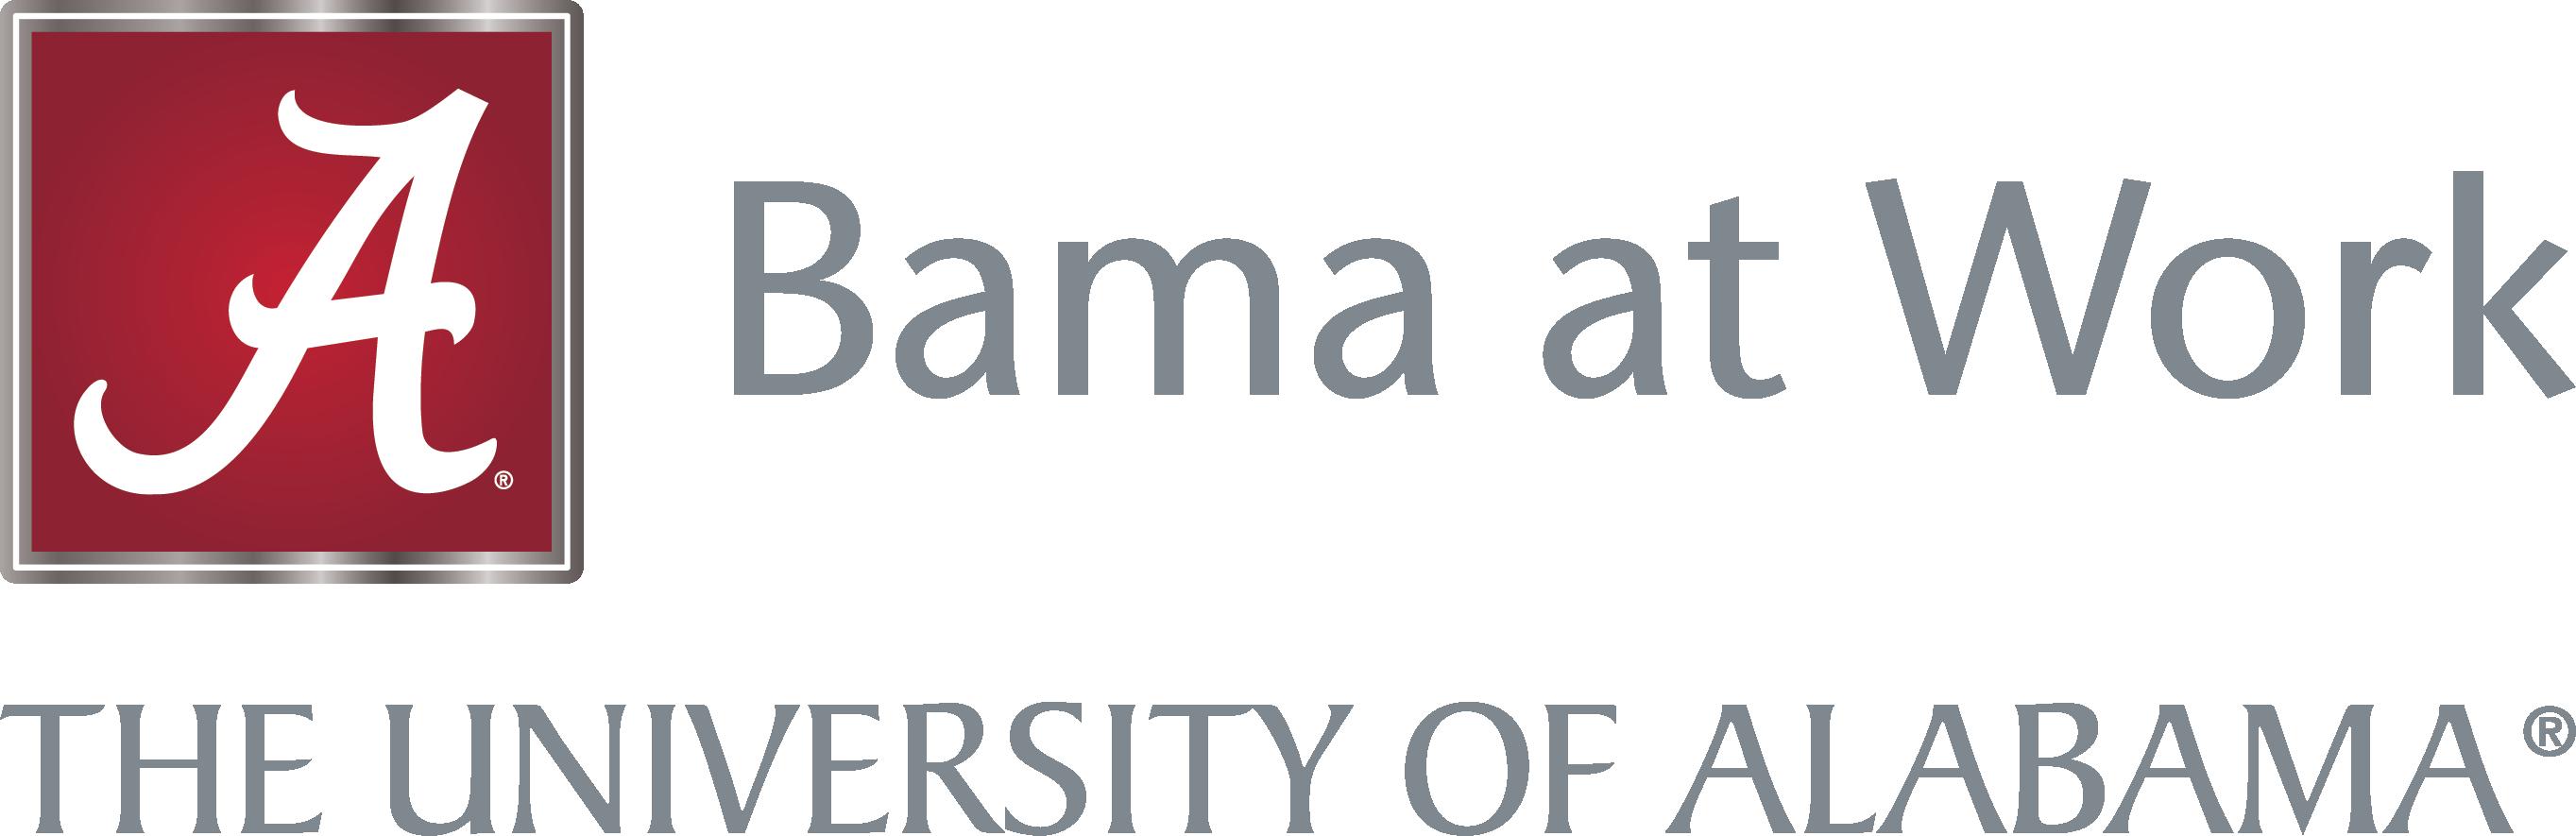 logocapstoneabamaatworksimplifiedgraysma